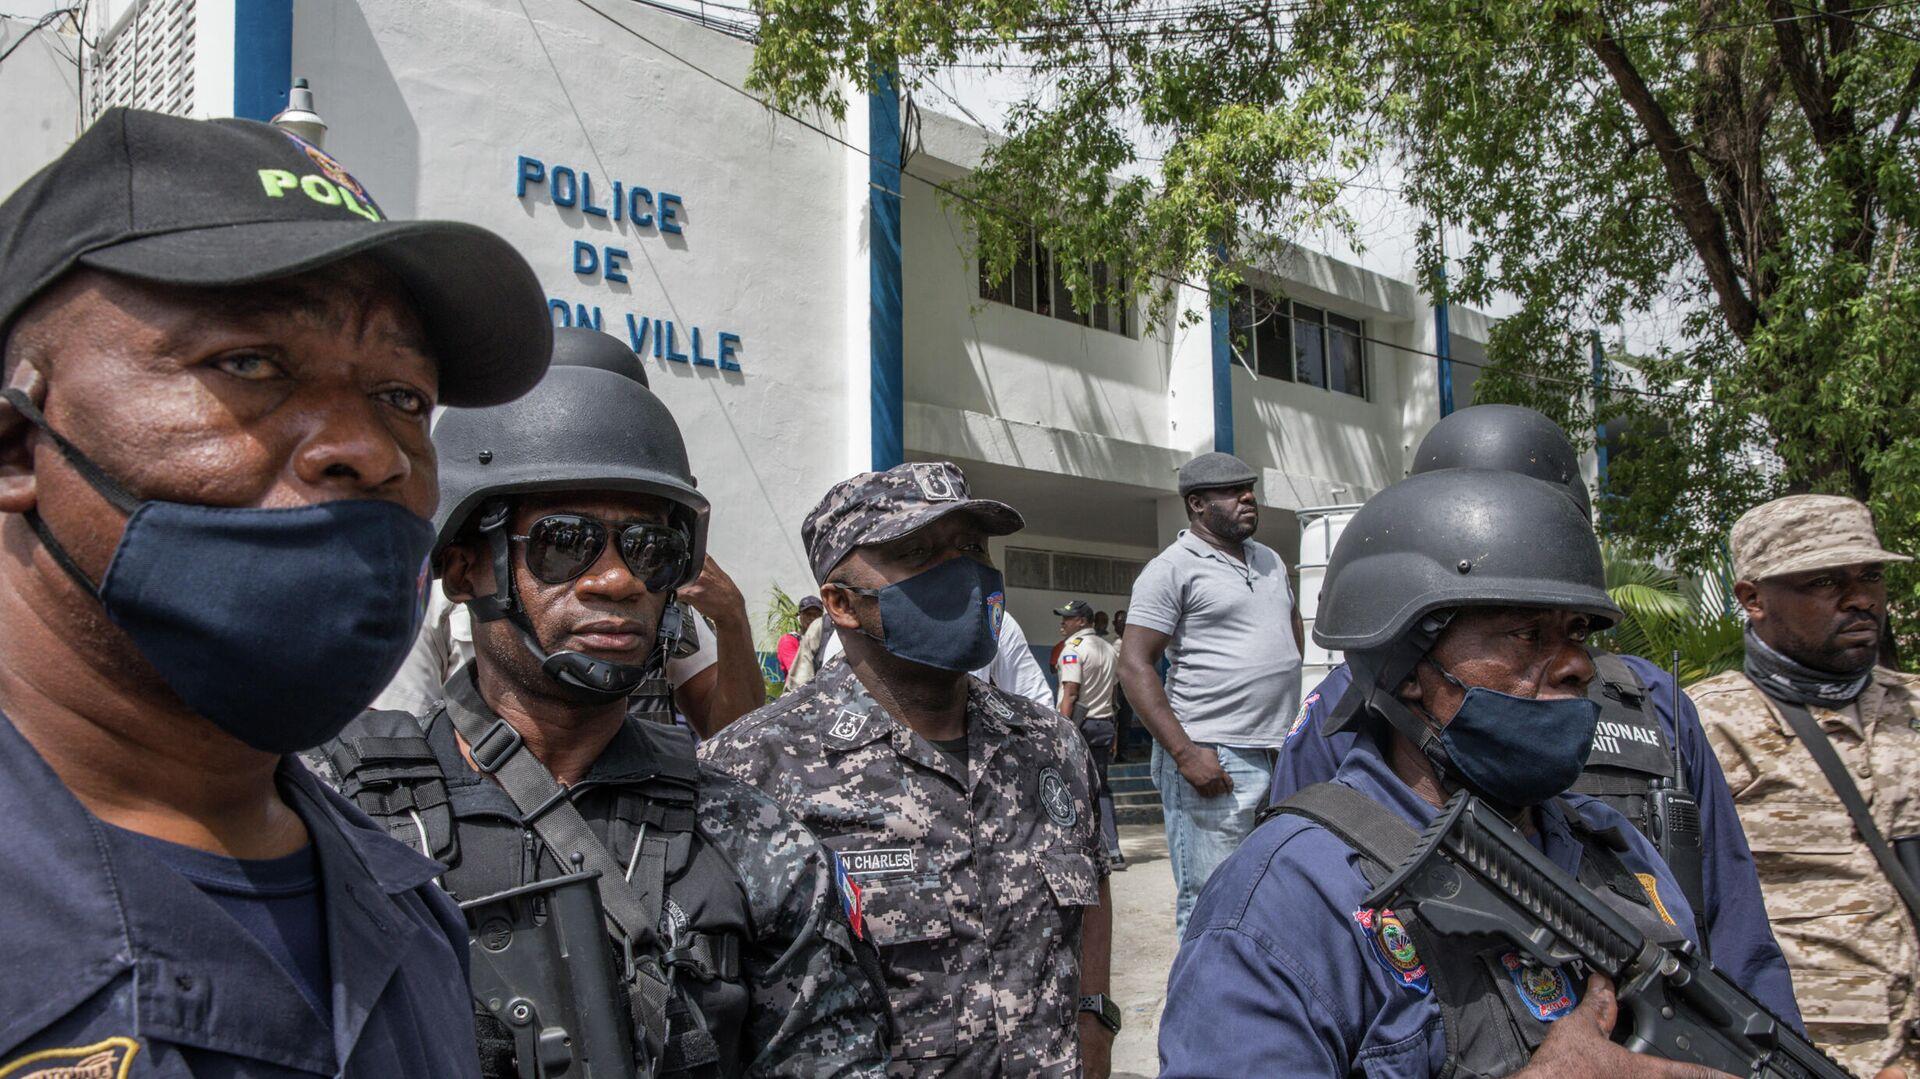 Policía de Haití en Puerto Príncipe - Sputnik Mundo, 1920, 09.07.2021